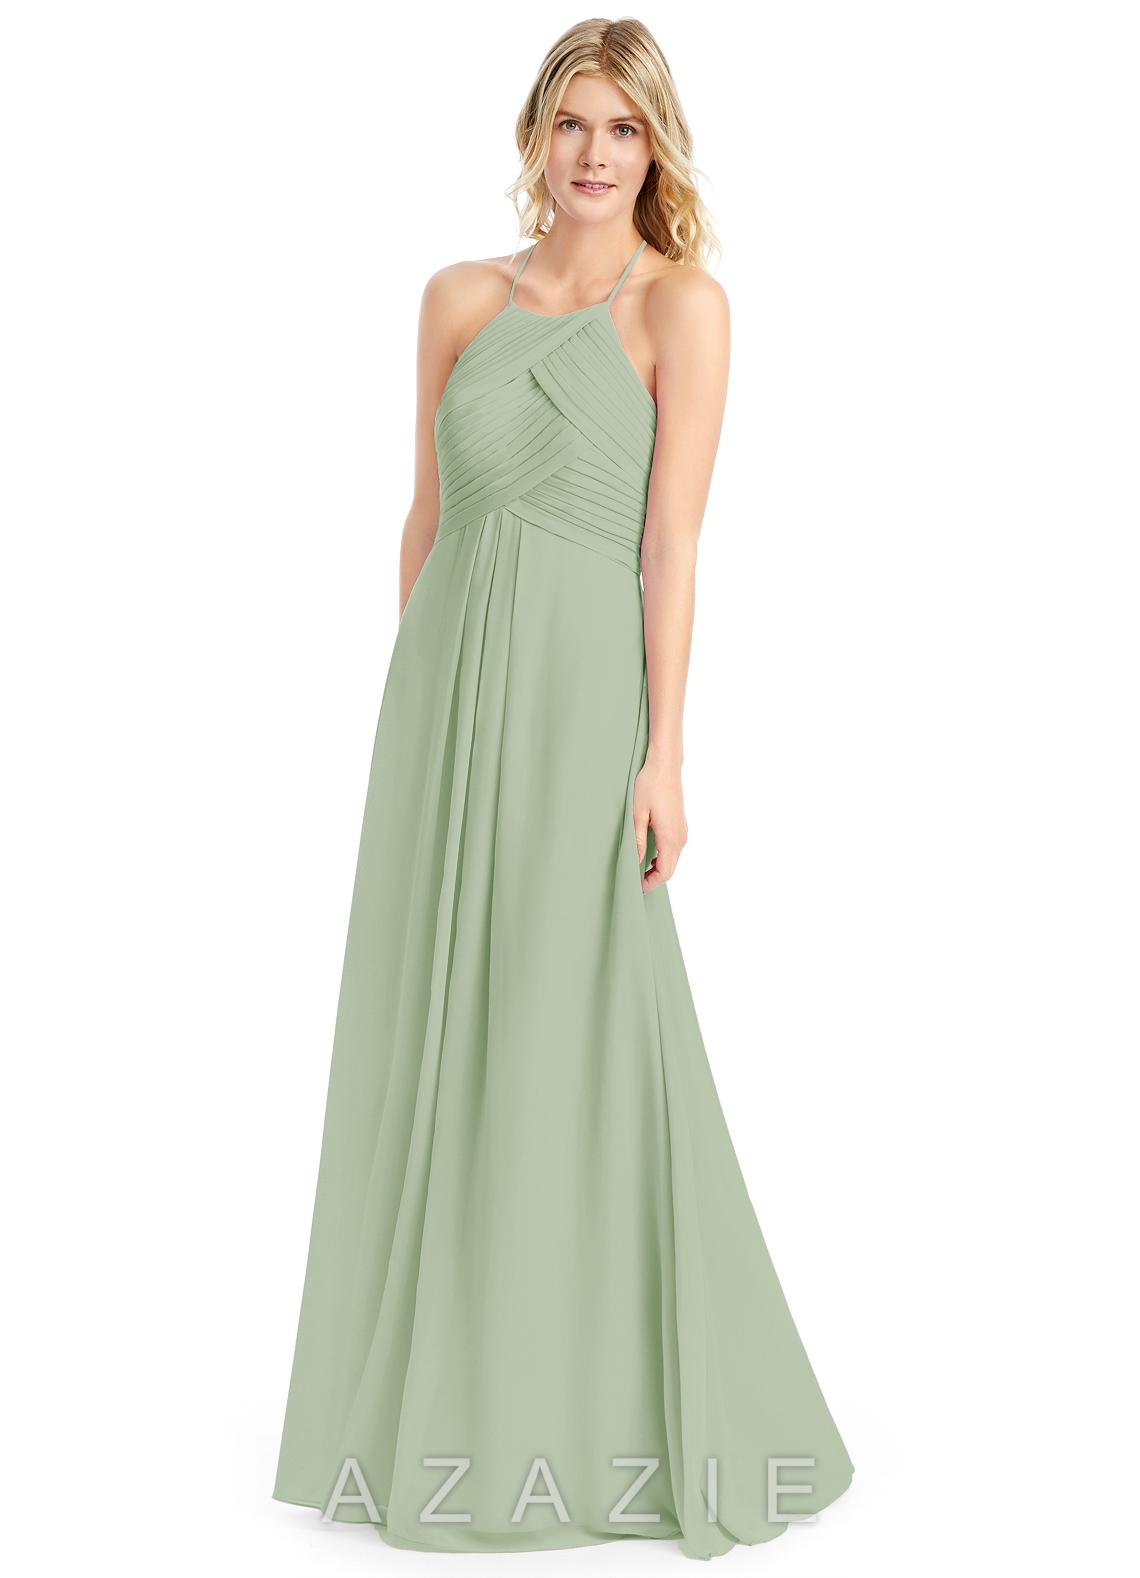 a5e946e56f4 Azazie Ginger Bridesmaid Dress - Dusty Sage